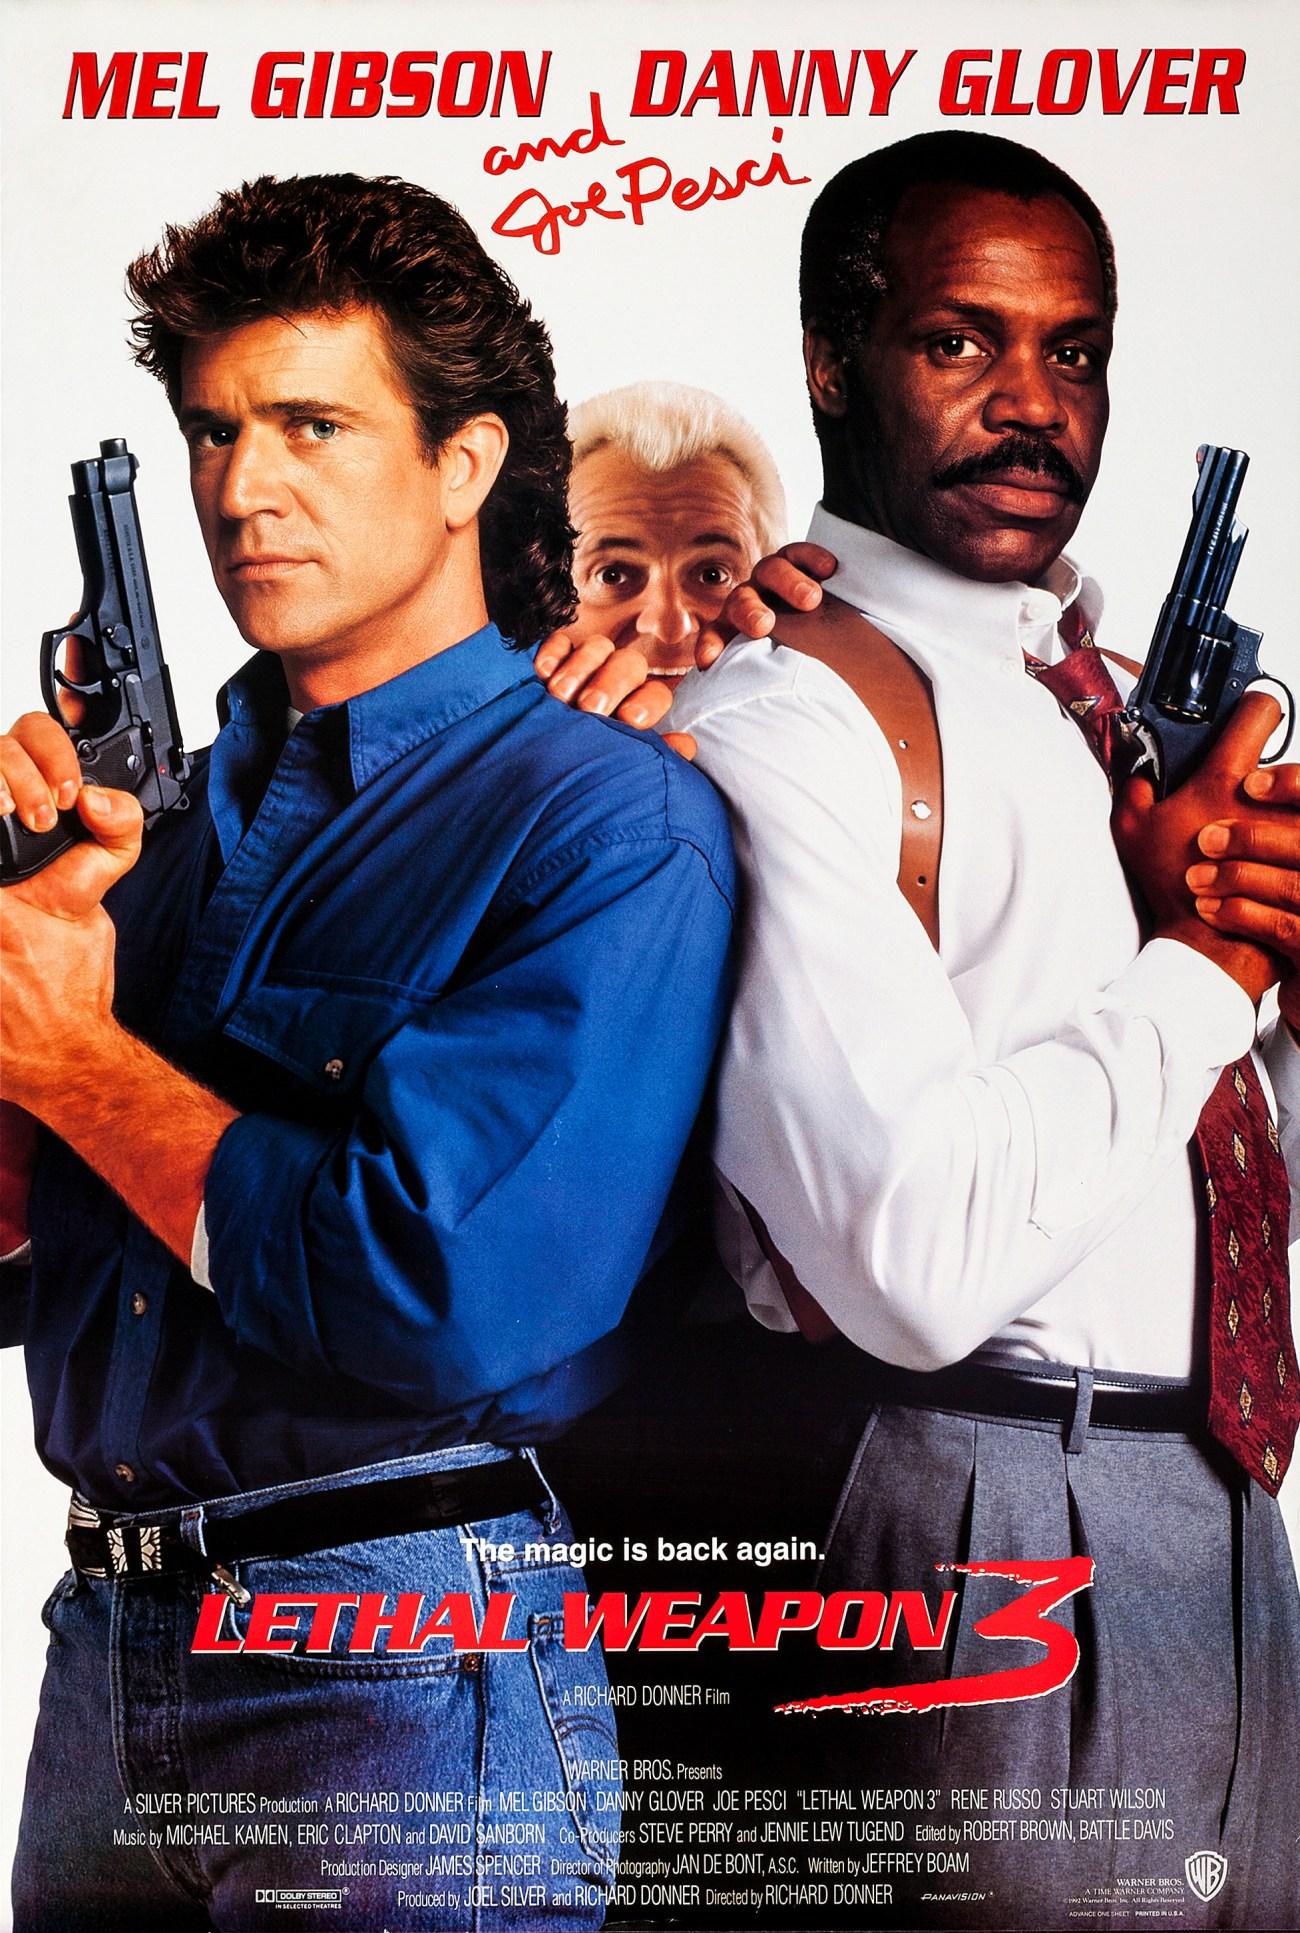 Póster de Lethal Weapon 3 (1992). Imagen: impawards.com